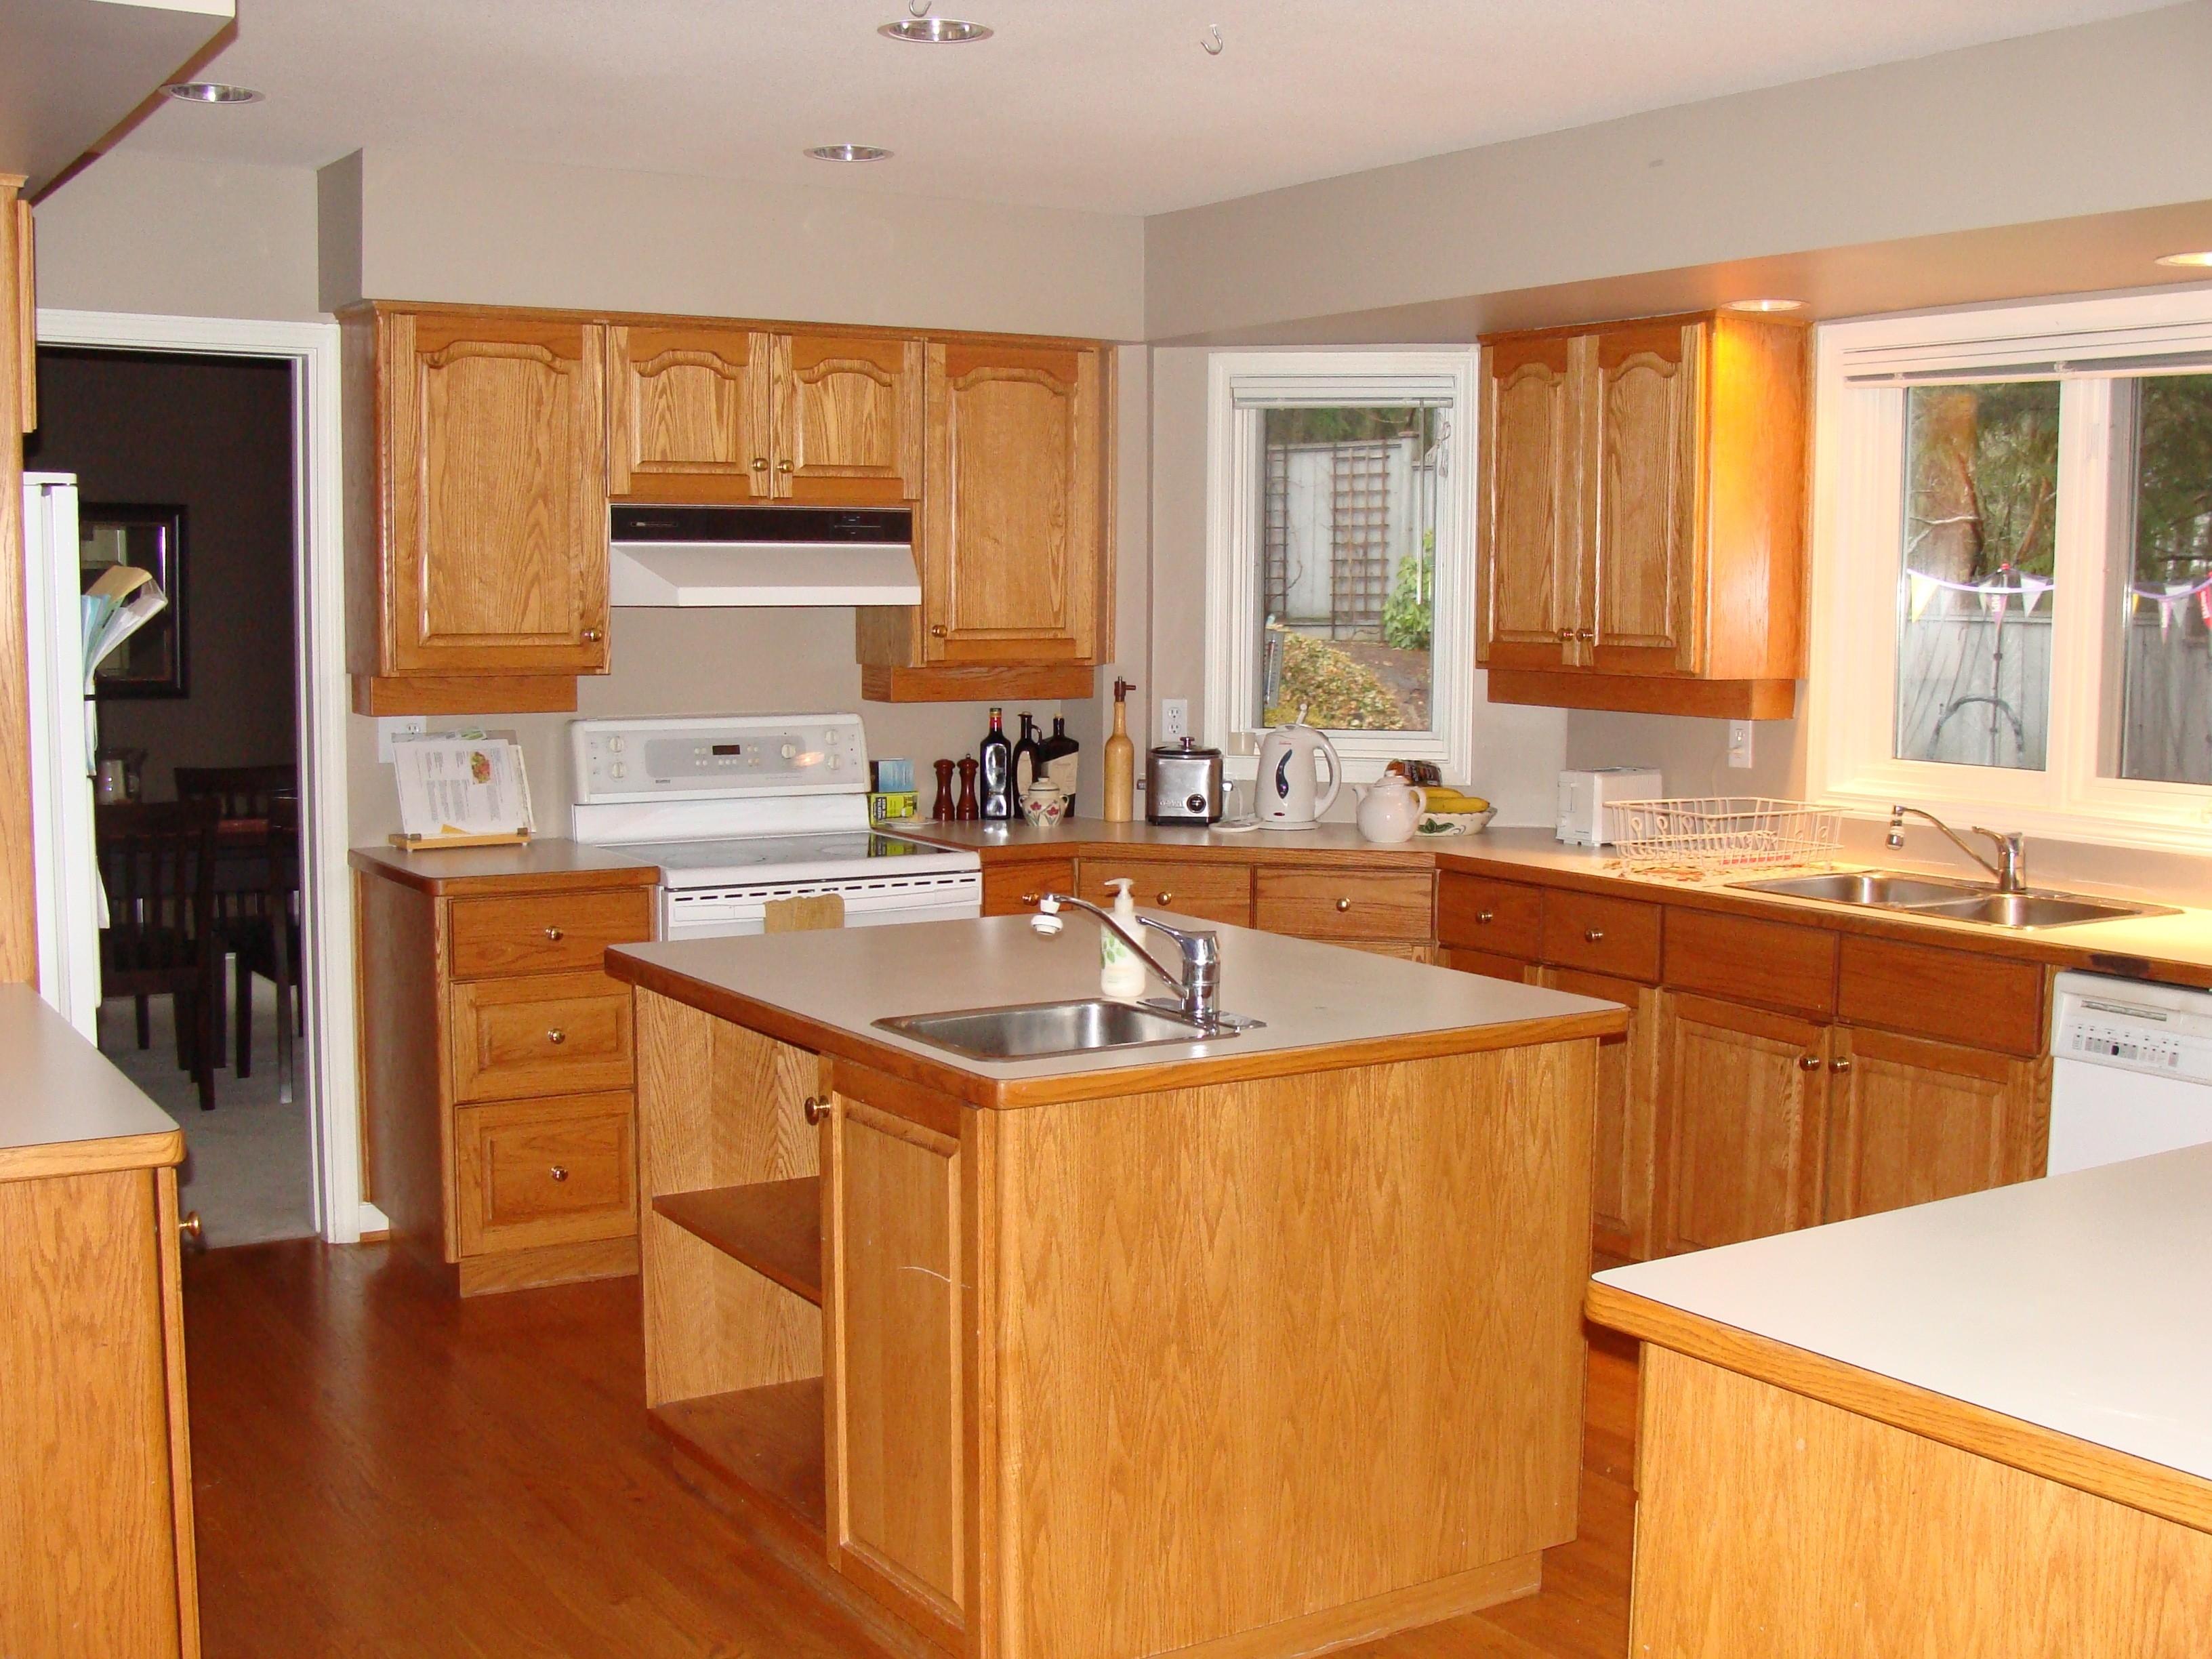 Semi Gloss Or Satin In Kitchen